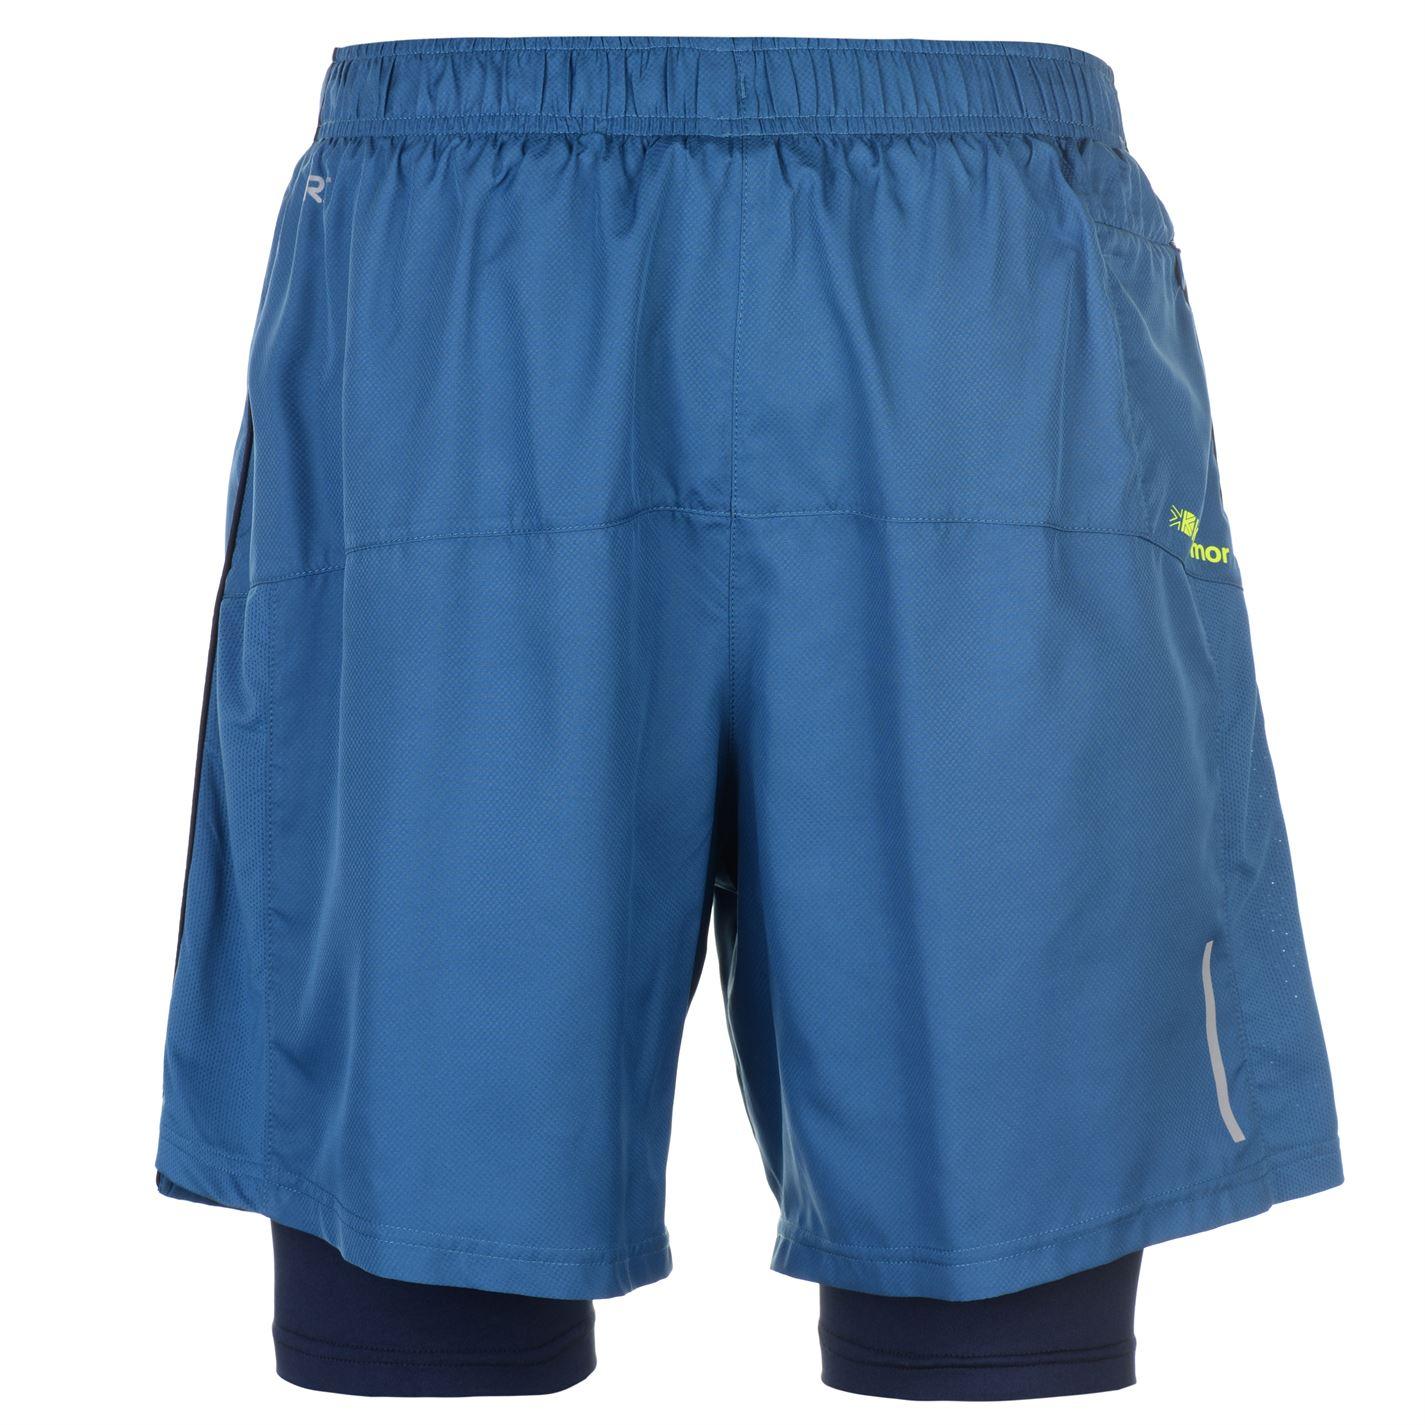 Karrimor-XLite-2in1-Shorts-Performance-Mens thumbnail 16